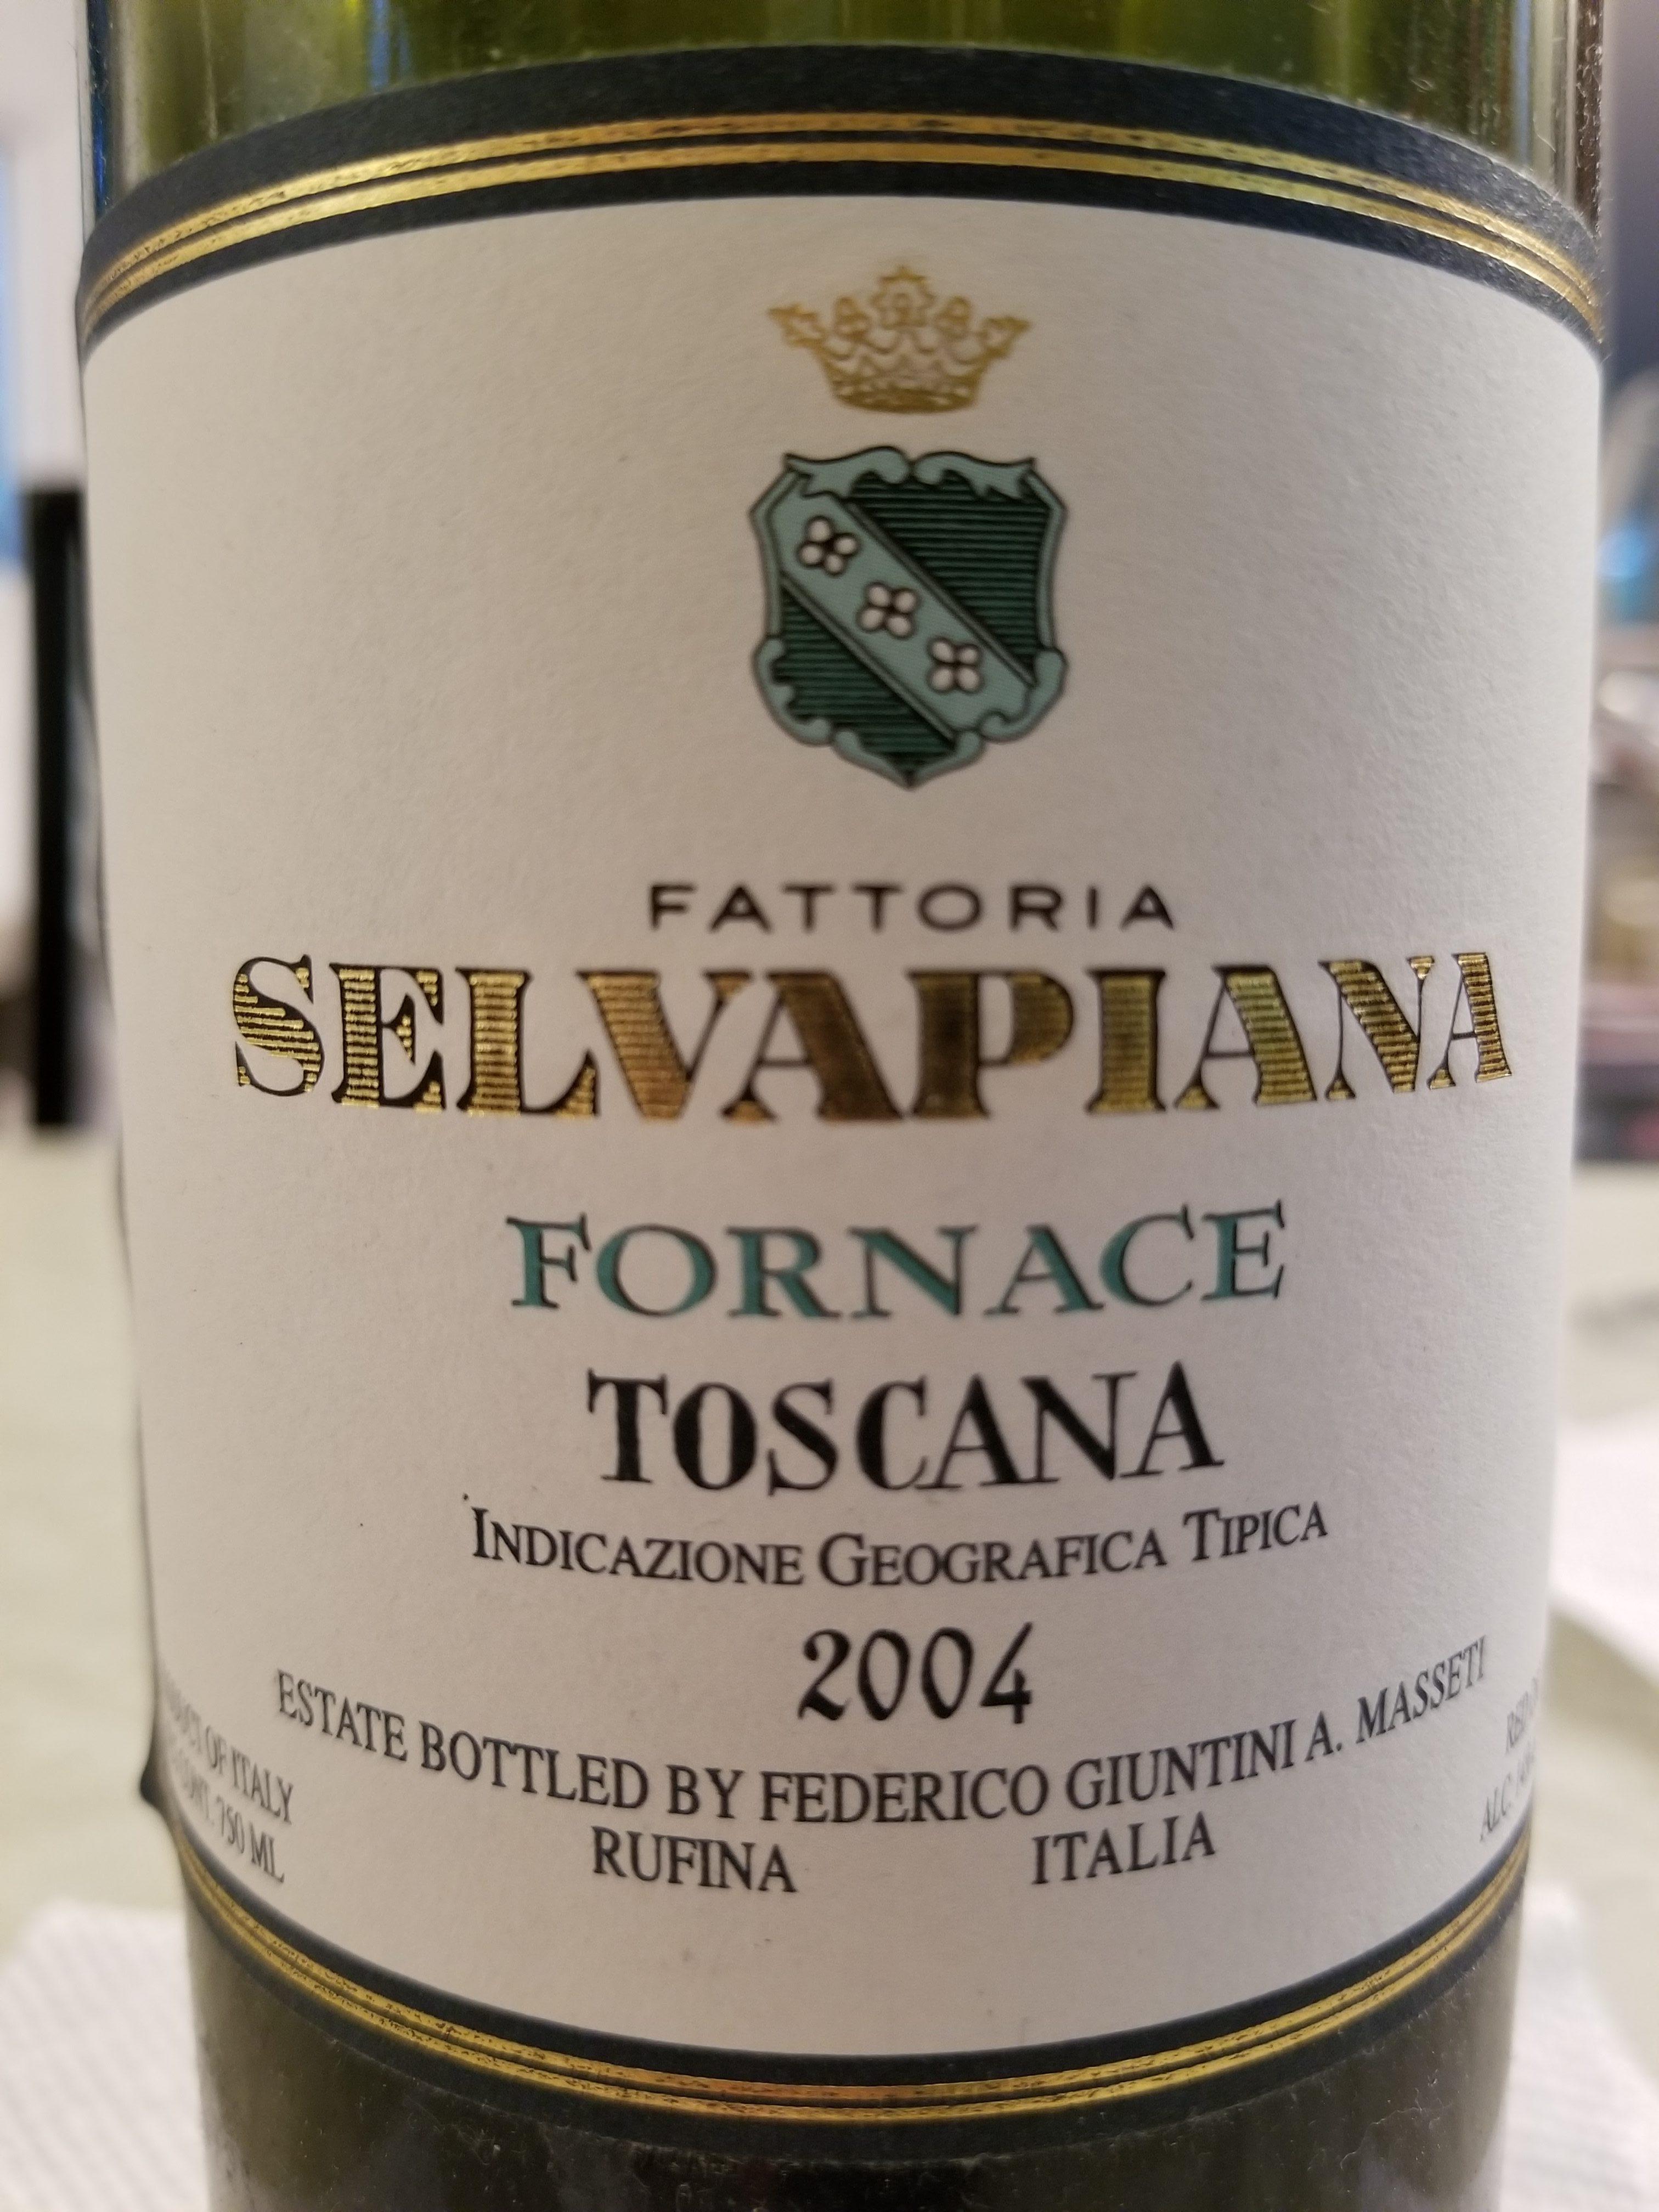 2004 Selvapiana Fornace Toscana Igt photo